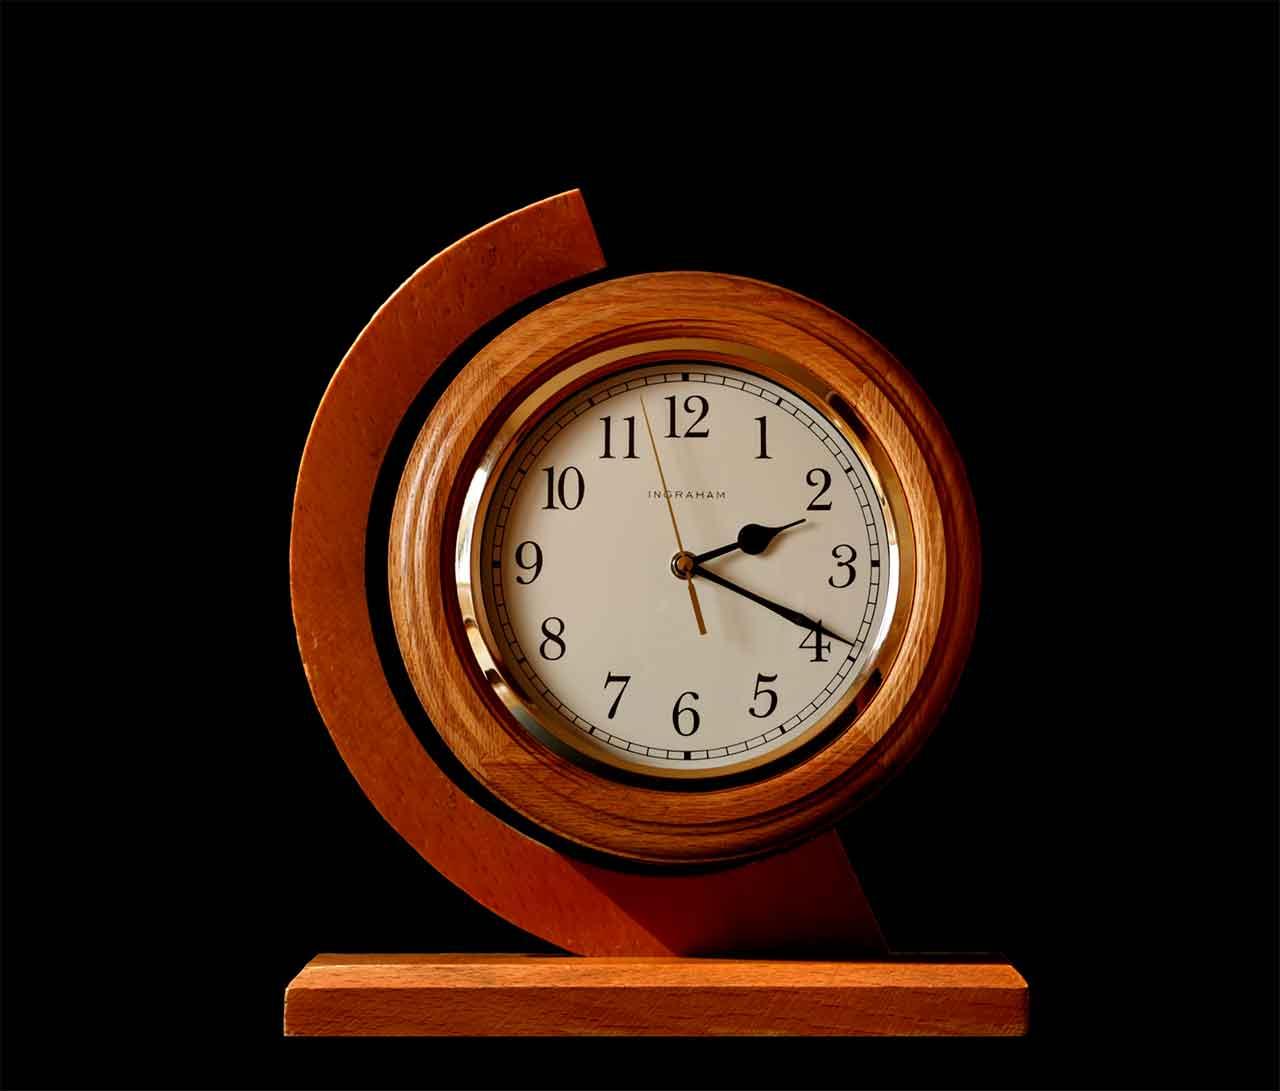 Holz Wood Chronographen Uhren Chronographencenter.de